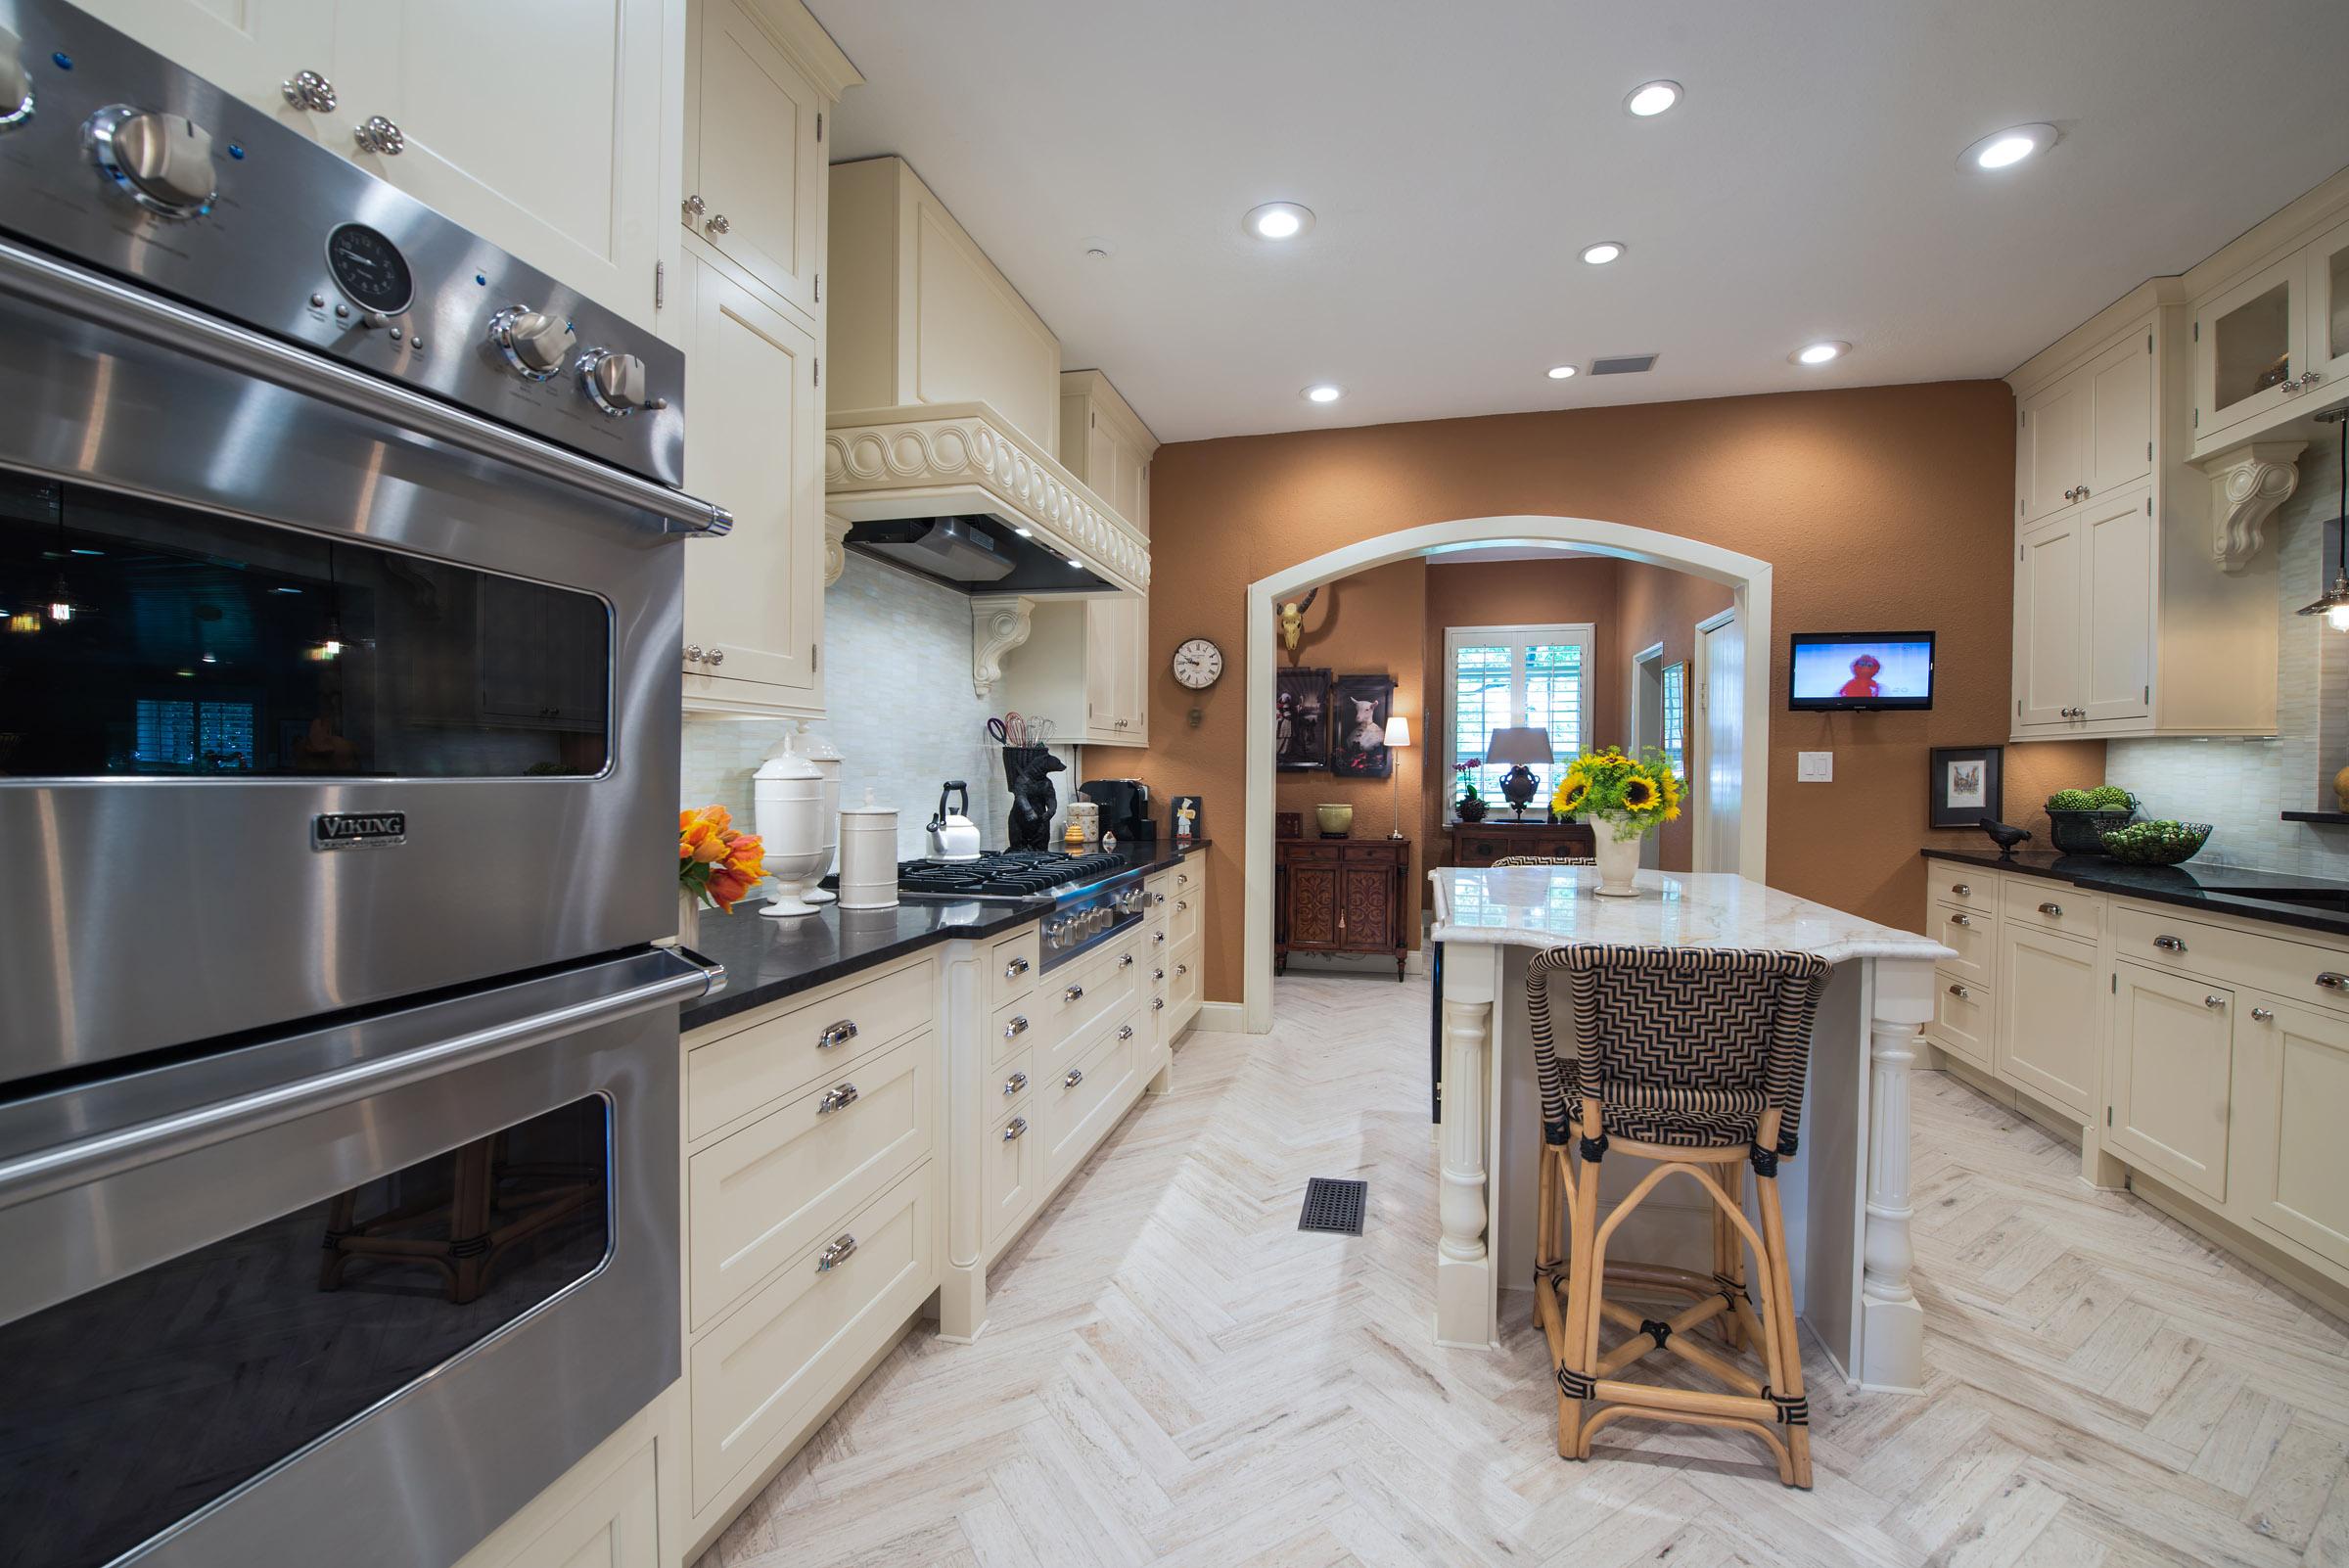 kitchen remodel san antonio sears appliances west elsmere cabinetry designs